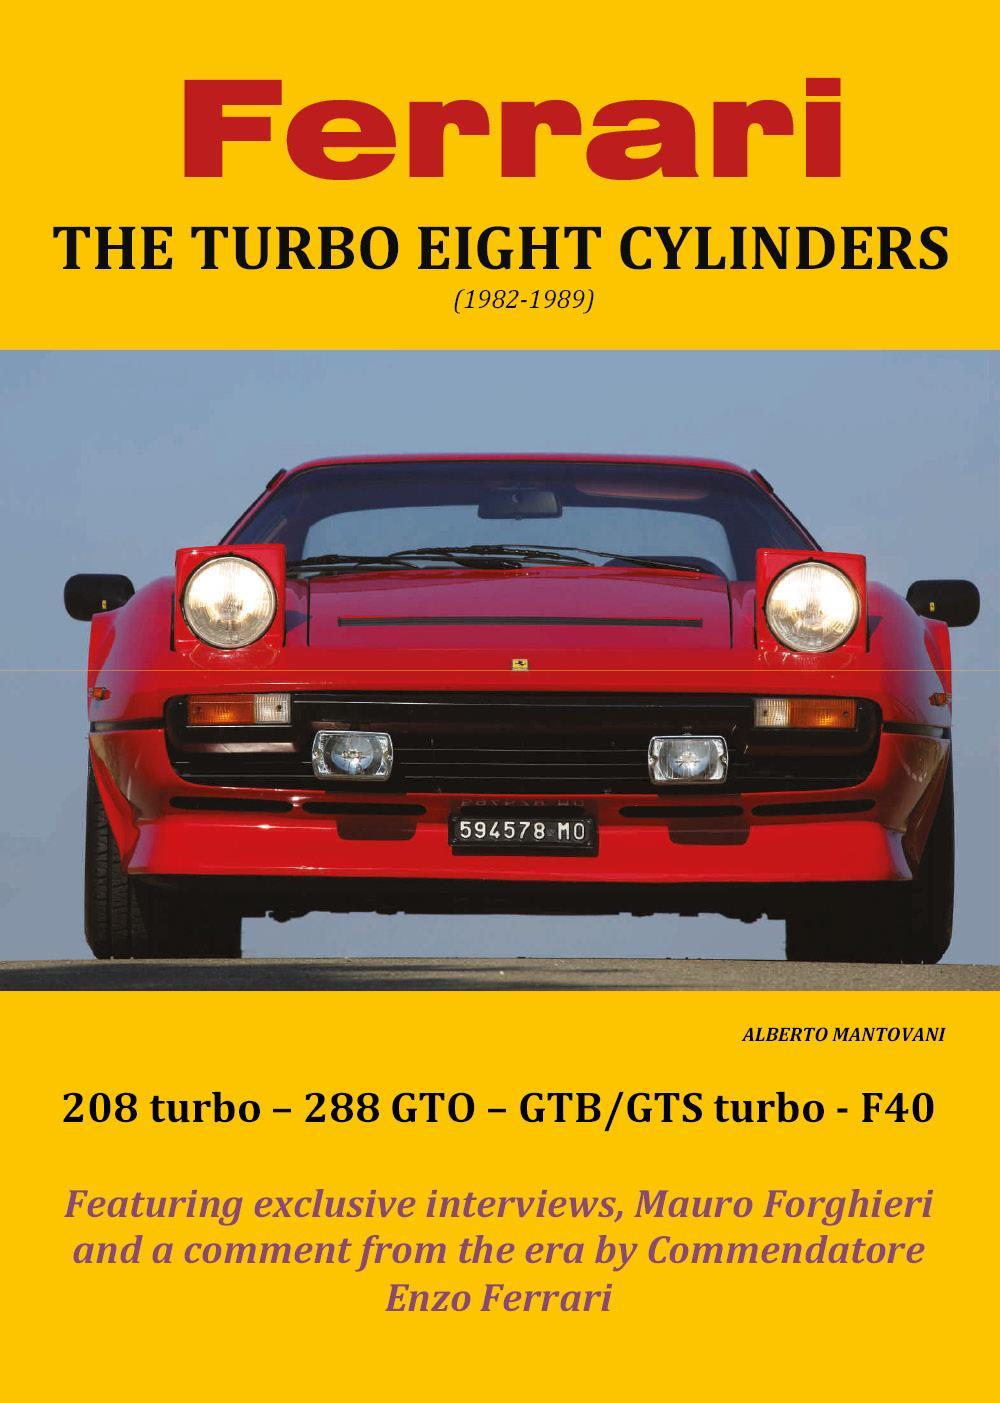 Ferrari THE TURBO EIGHT CYLINDERS (1982-1989)